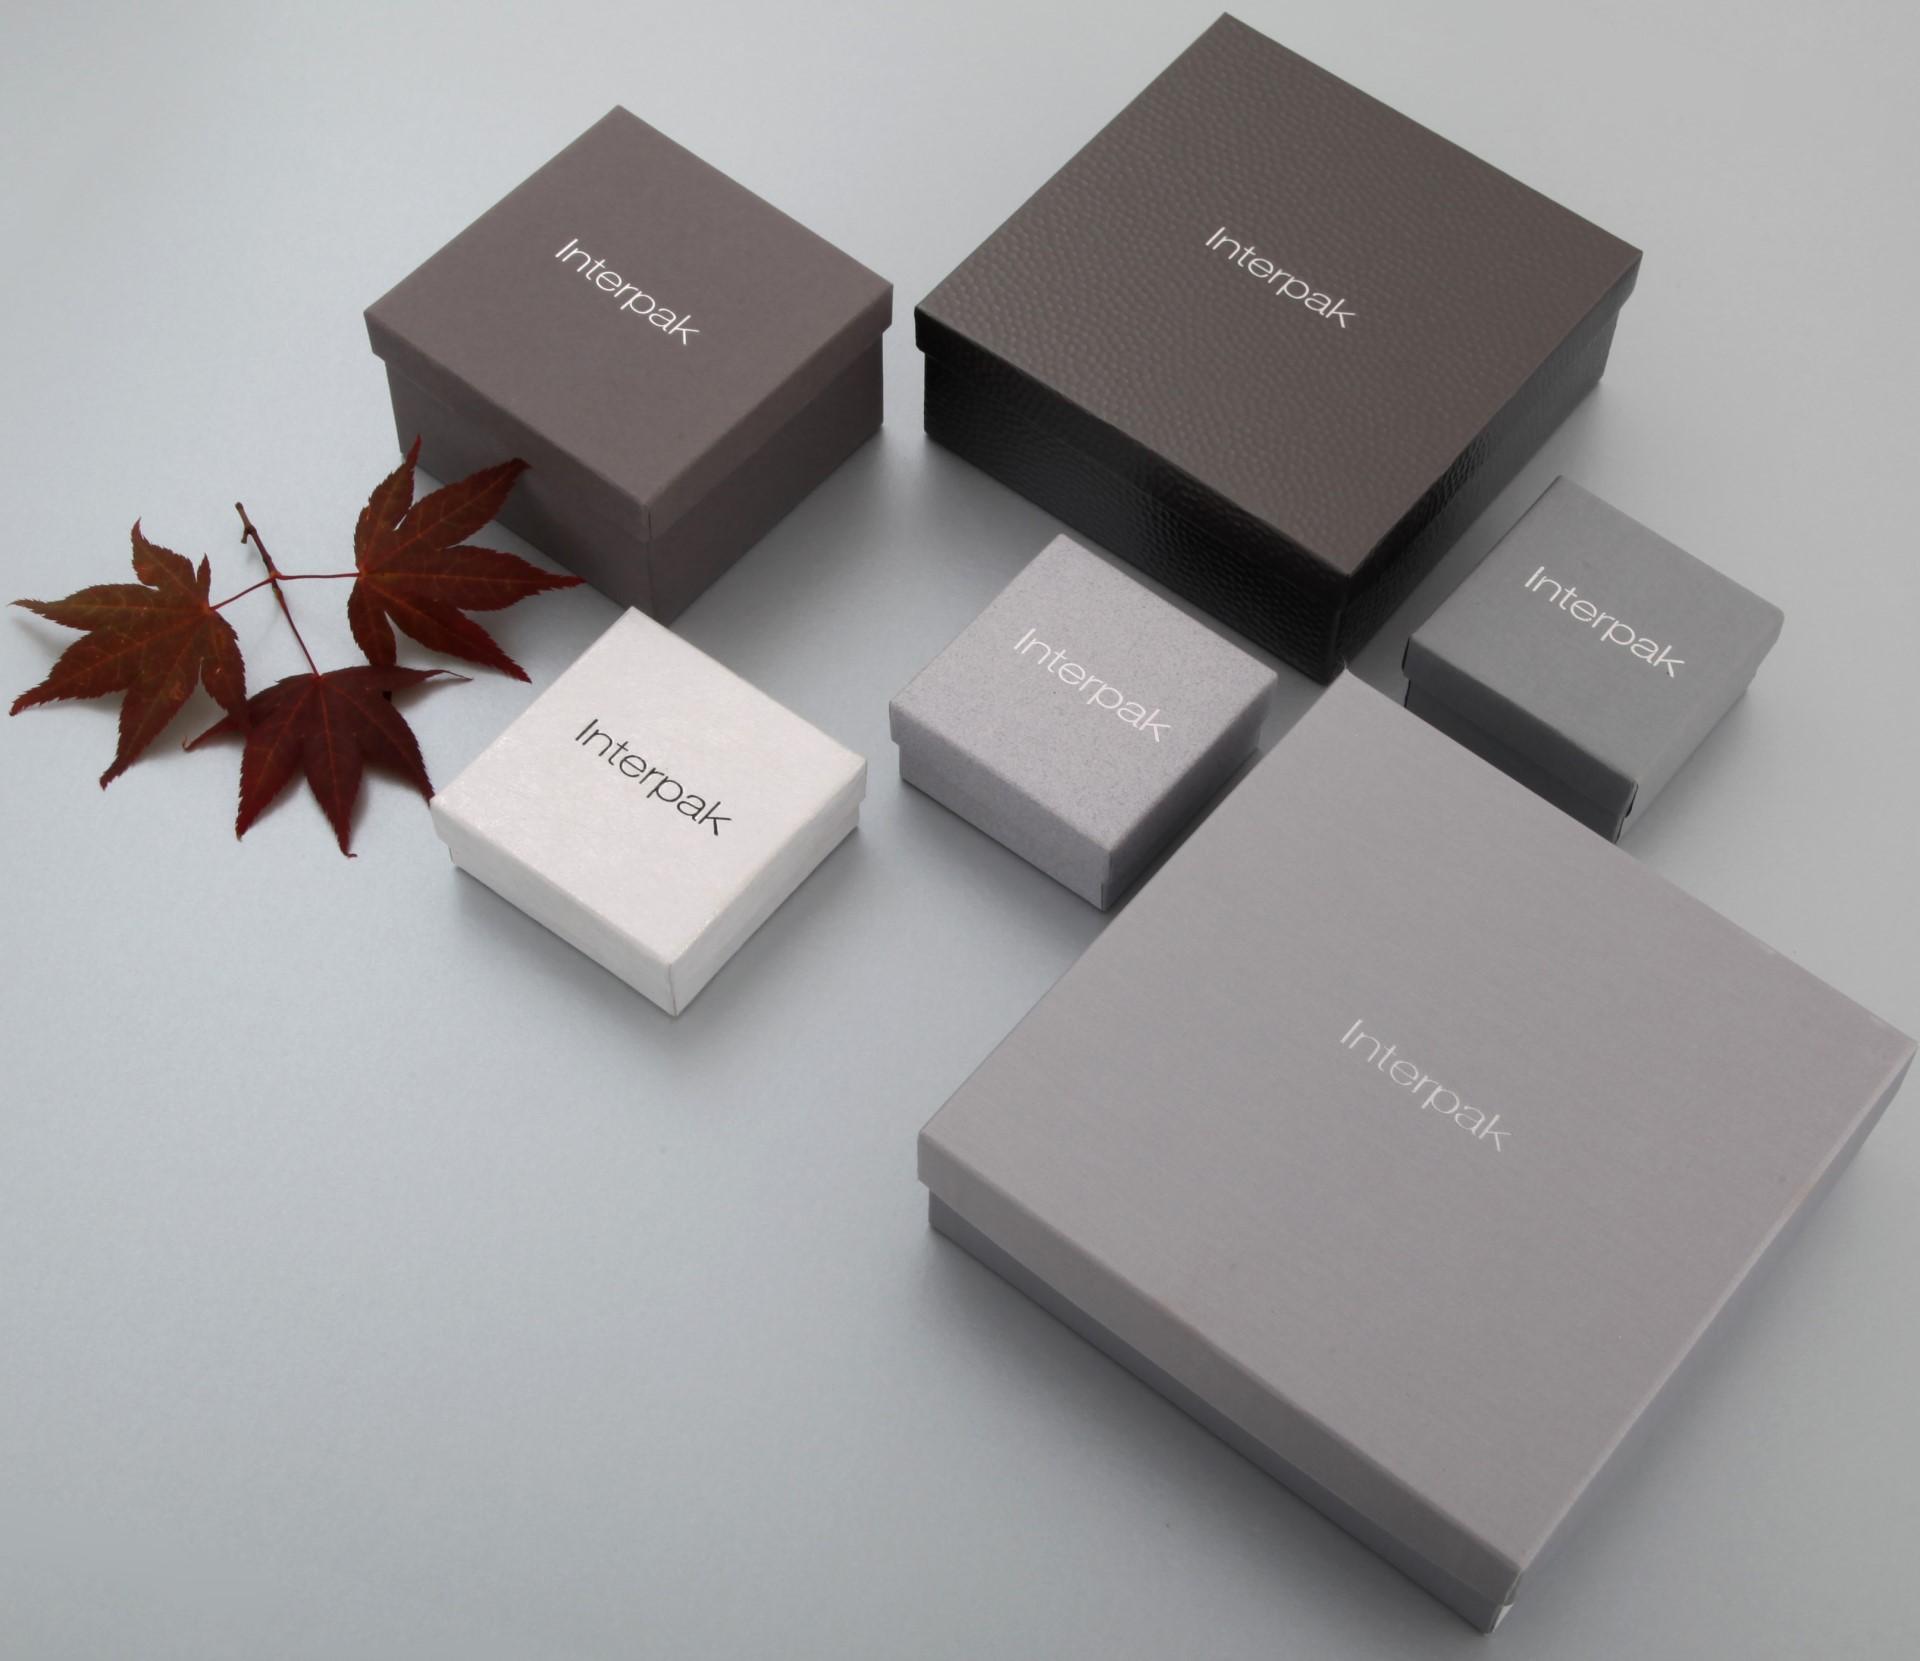 UK Made Cardboard Boxes